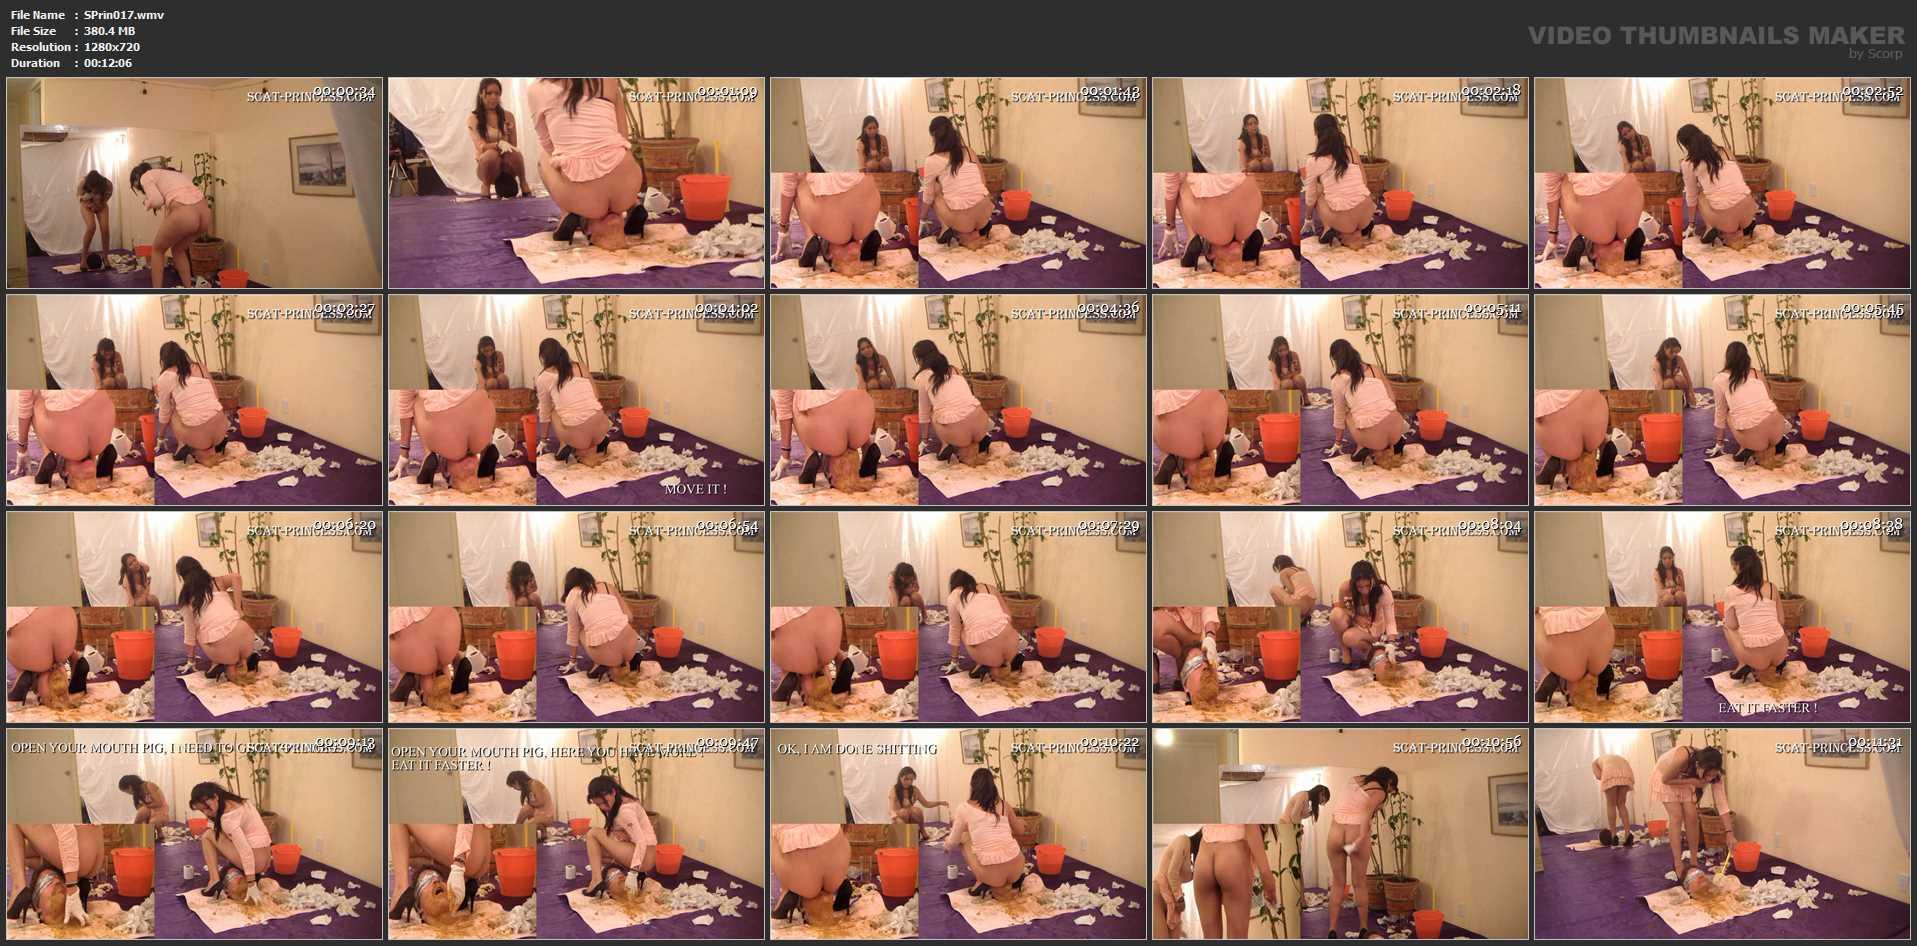 [SCAT-PRINCESS] How many Girls can a Toilet Slave take Part 12 Adison [HD][720p][WMV]